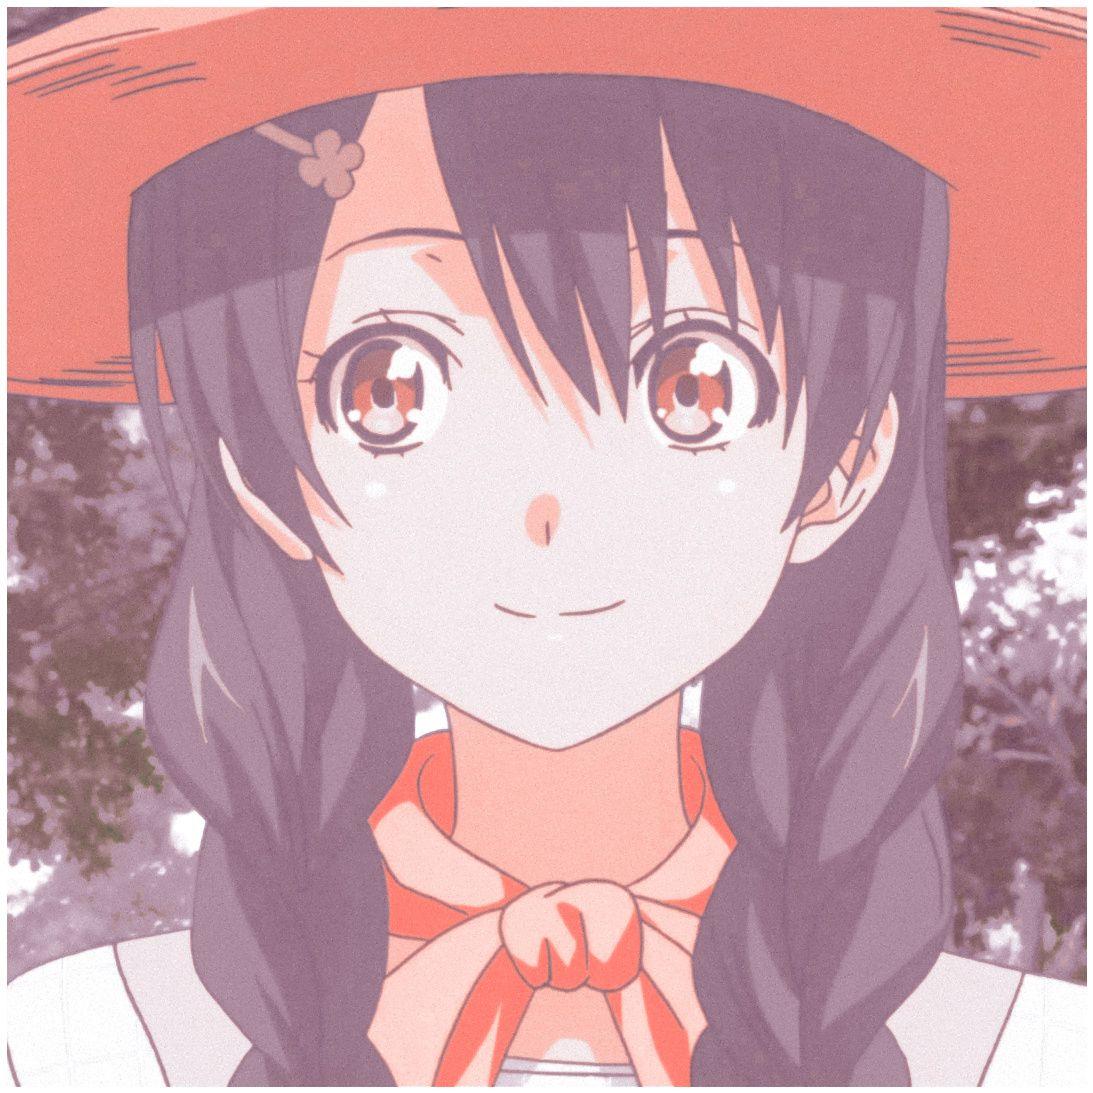 Megumi Tadokoro Icon In 2020 Aesthetic Anime Anime Wall Art Anime